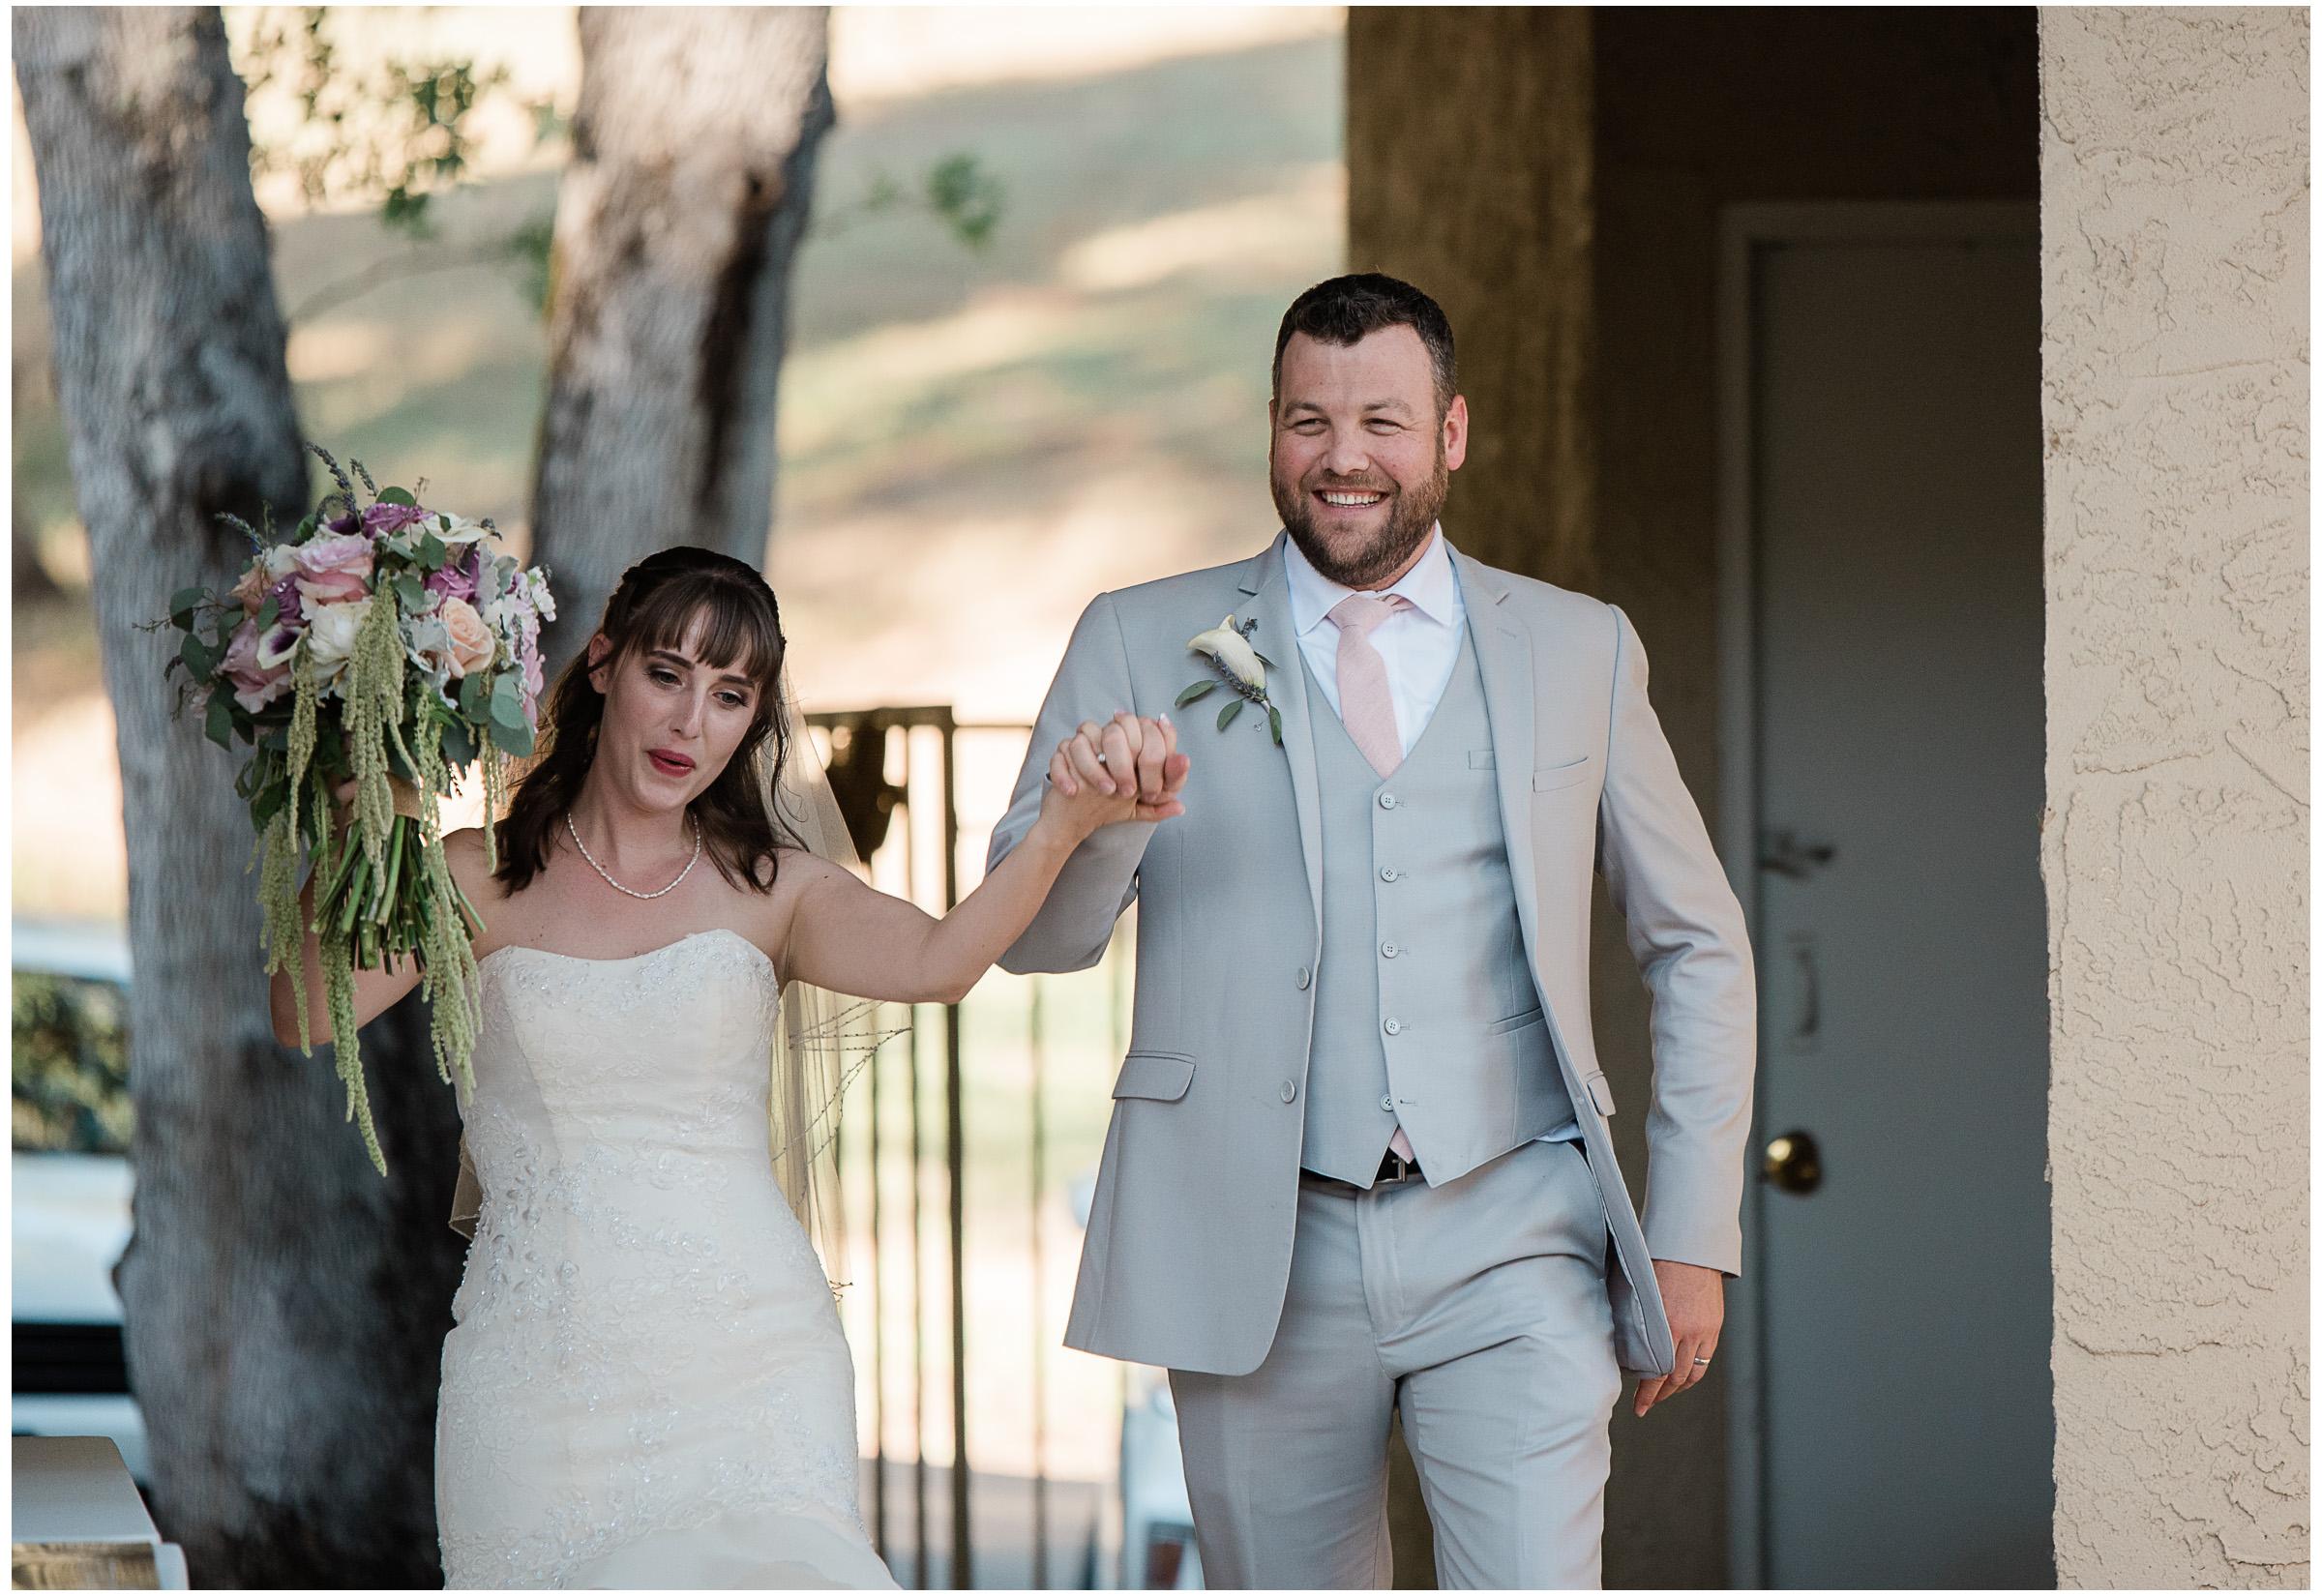 Placerville Wedding - Sacramento Photographer - Justin Wilcox Photography - 18.jpg